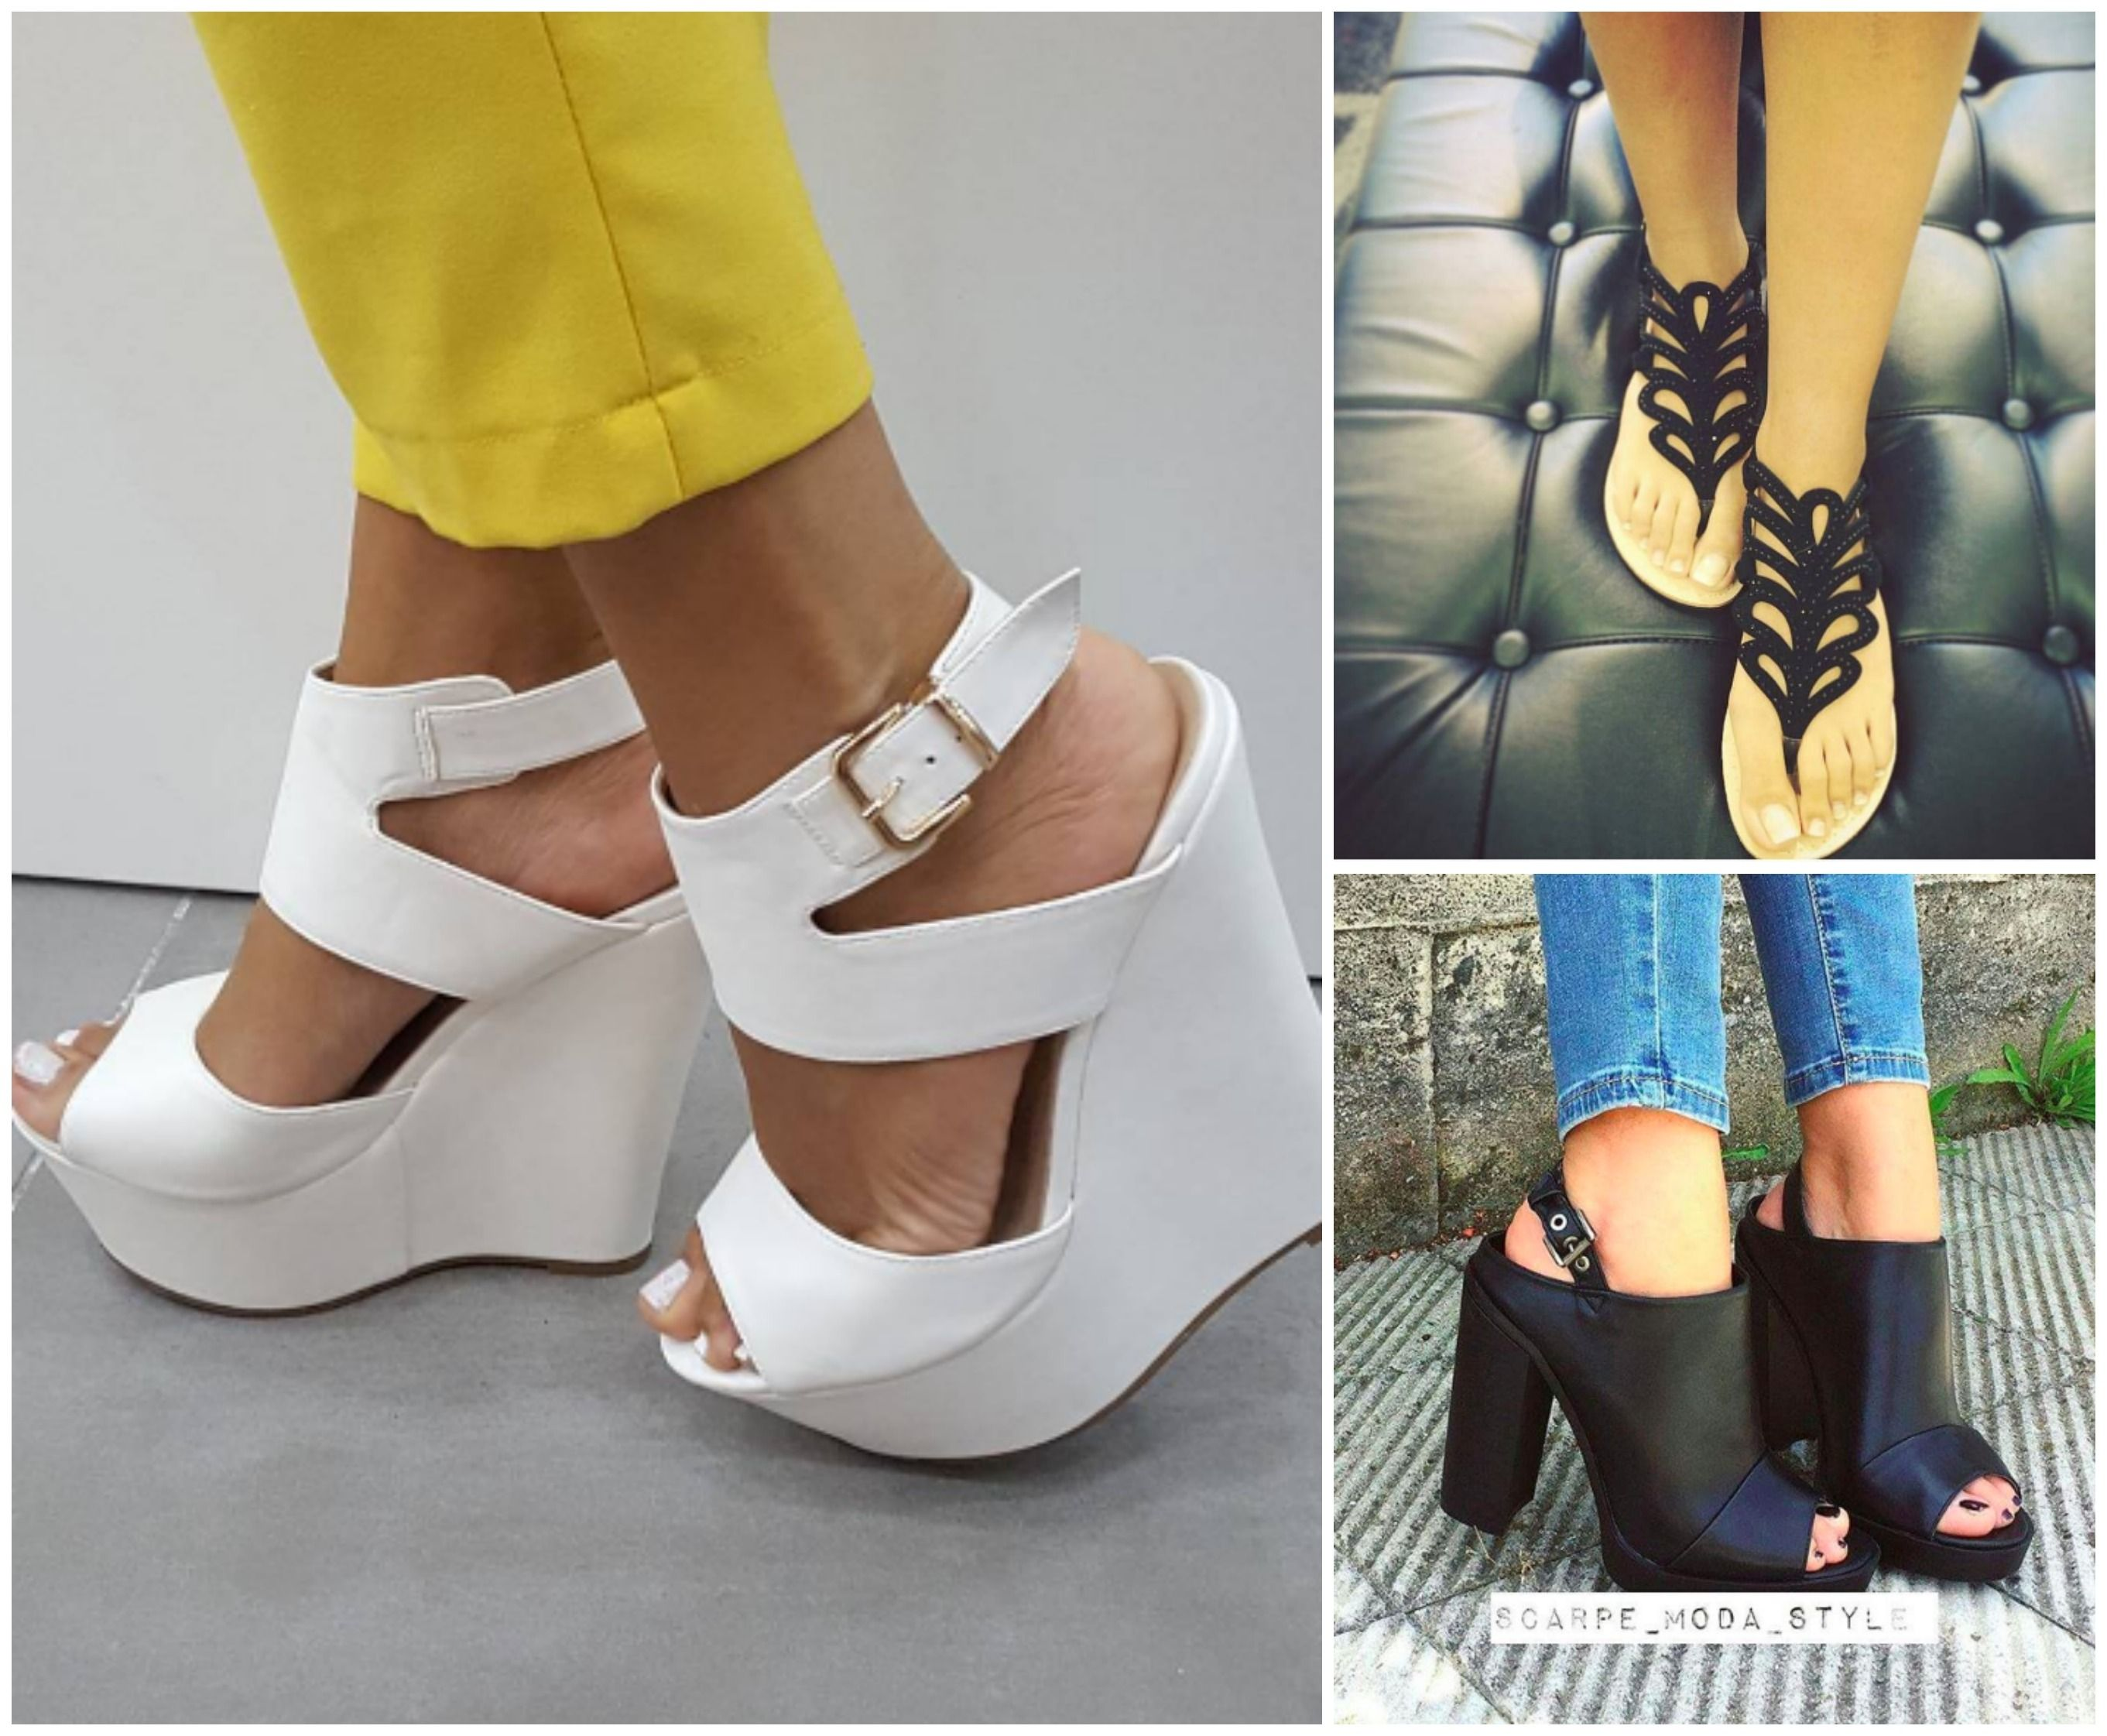 scarpemodashoes2